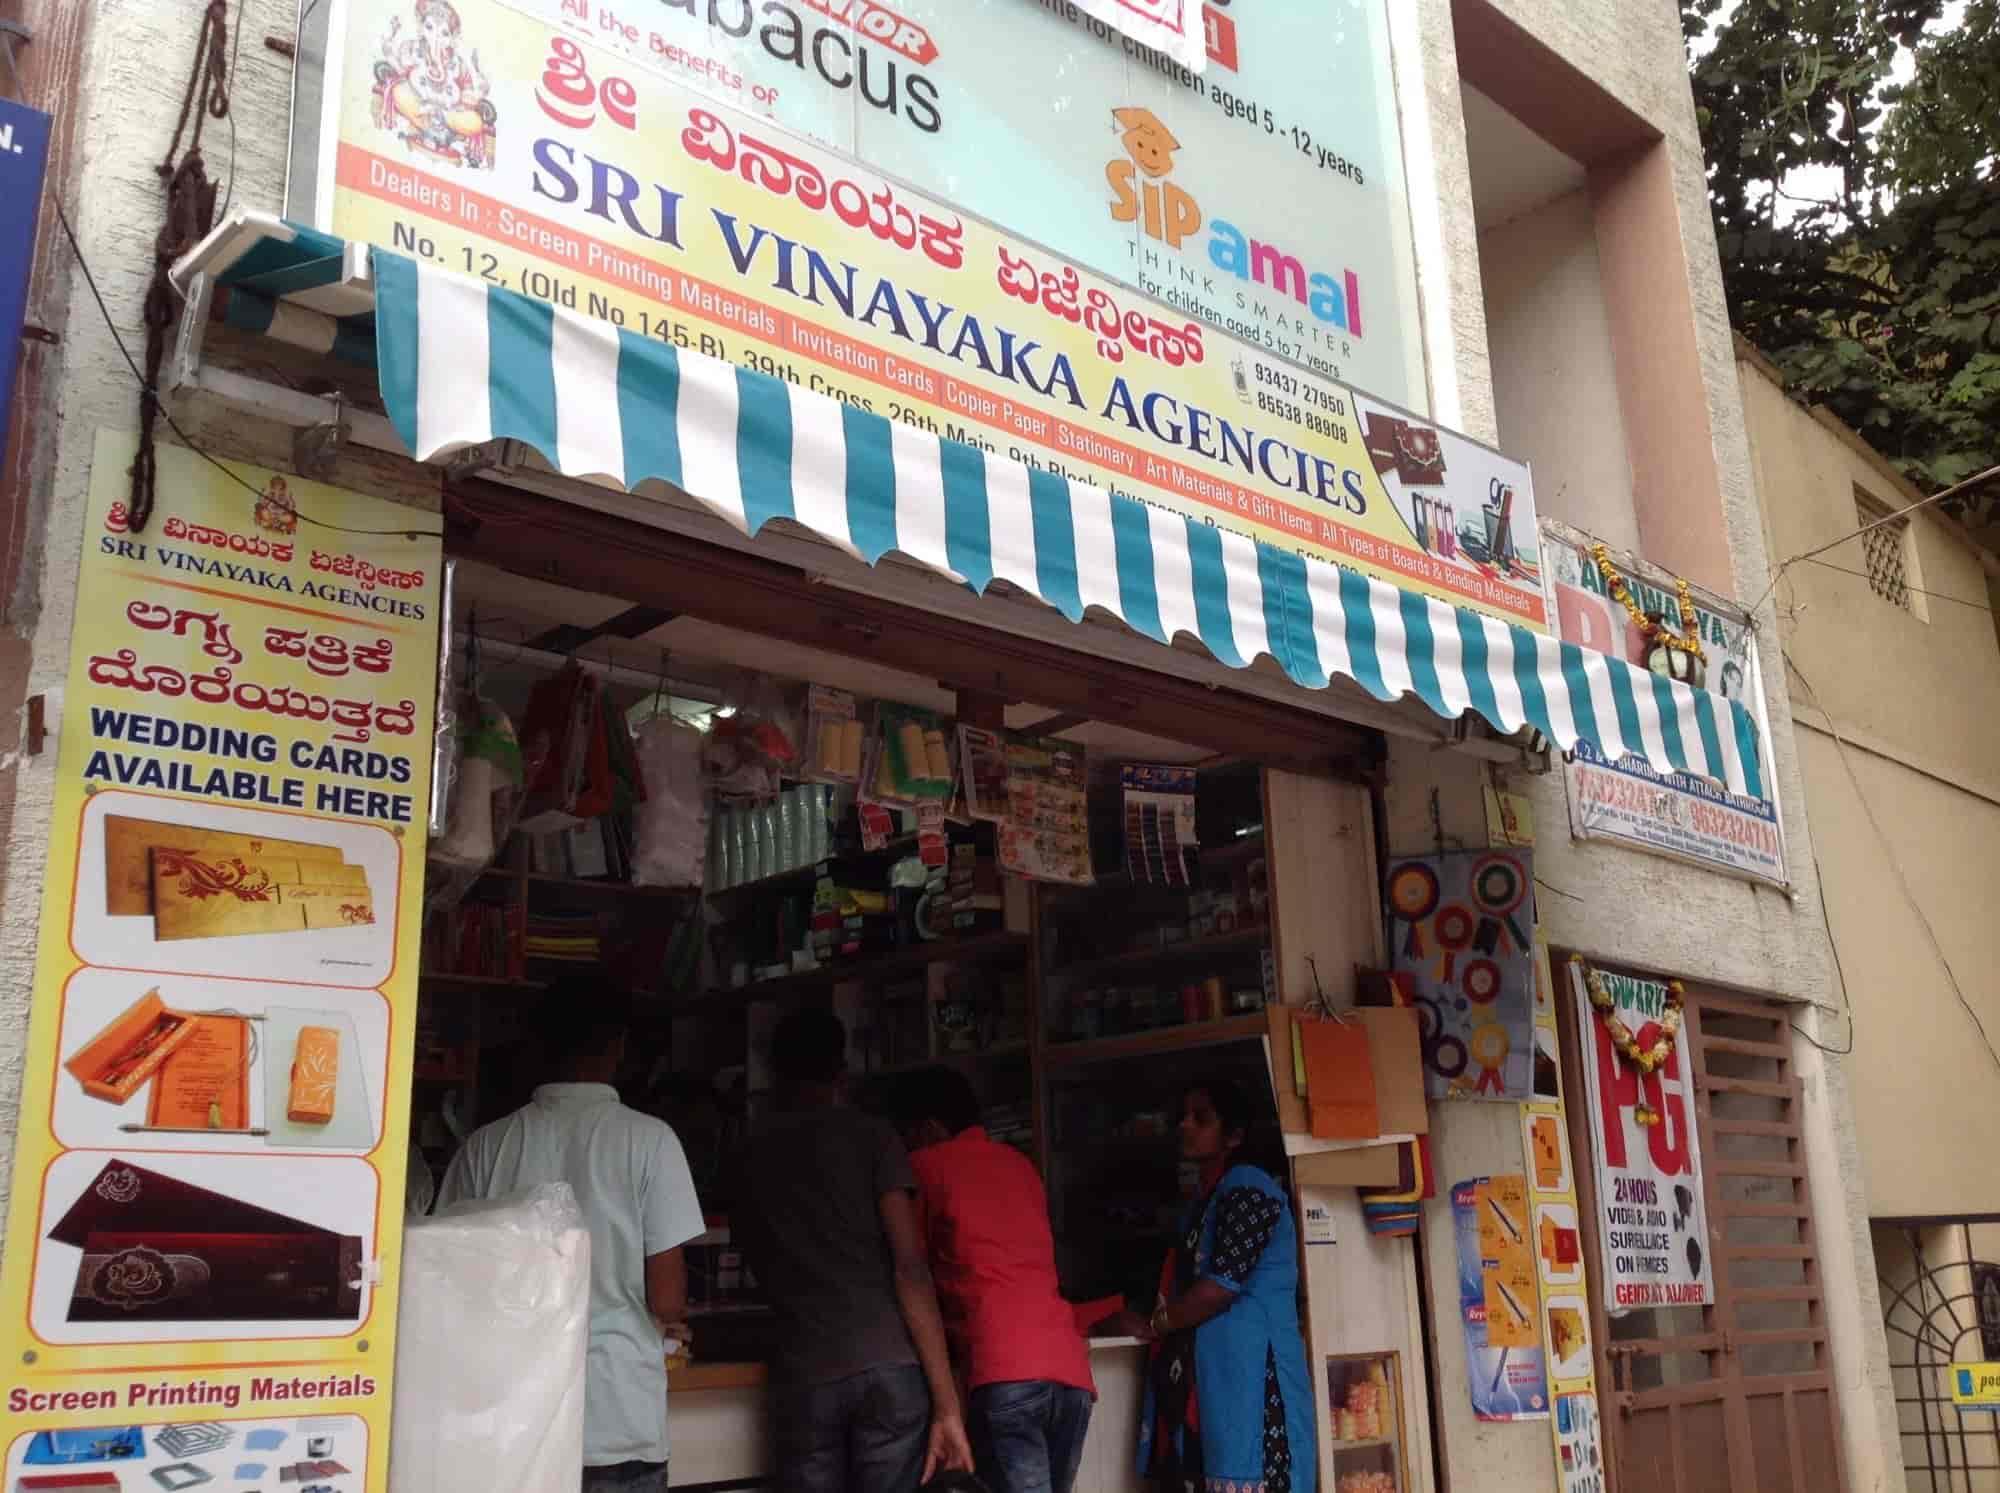 Sri vinayaka agencies jayanagar 9th block sri vinayak agencies sri vinayaka agencies jayanagar 9th block sri vinayak agencies printers for visiting card in bangalore justdial stopboris Choice Image